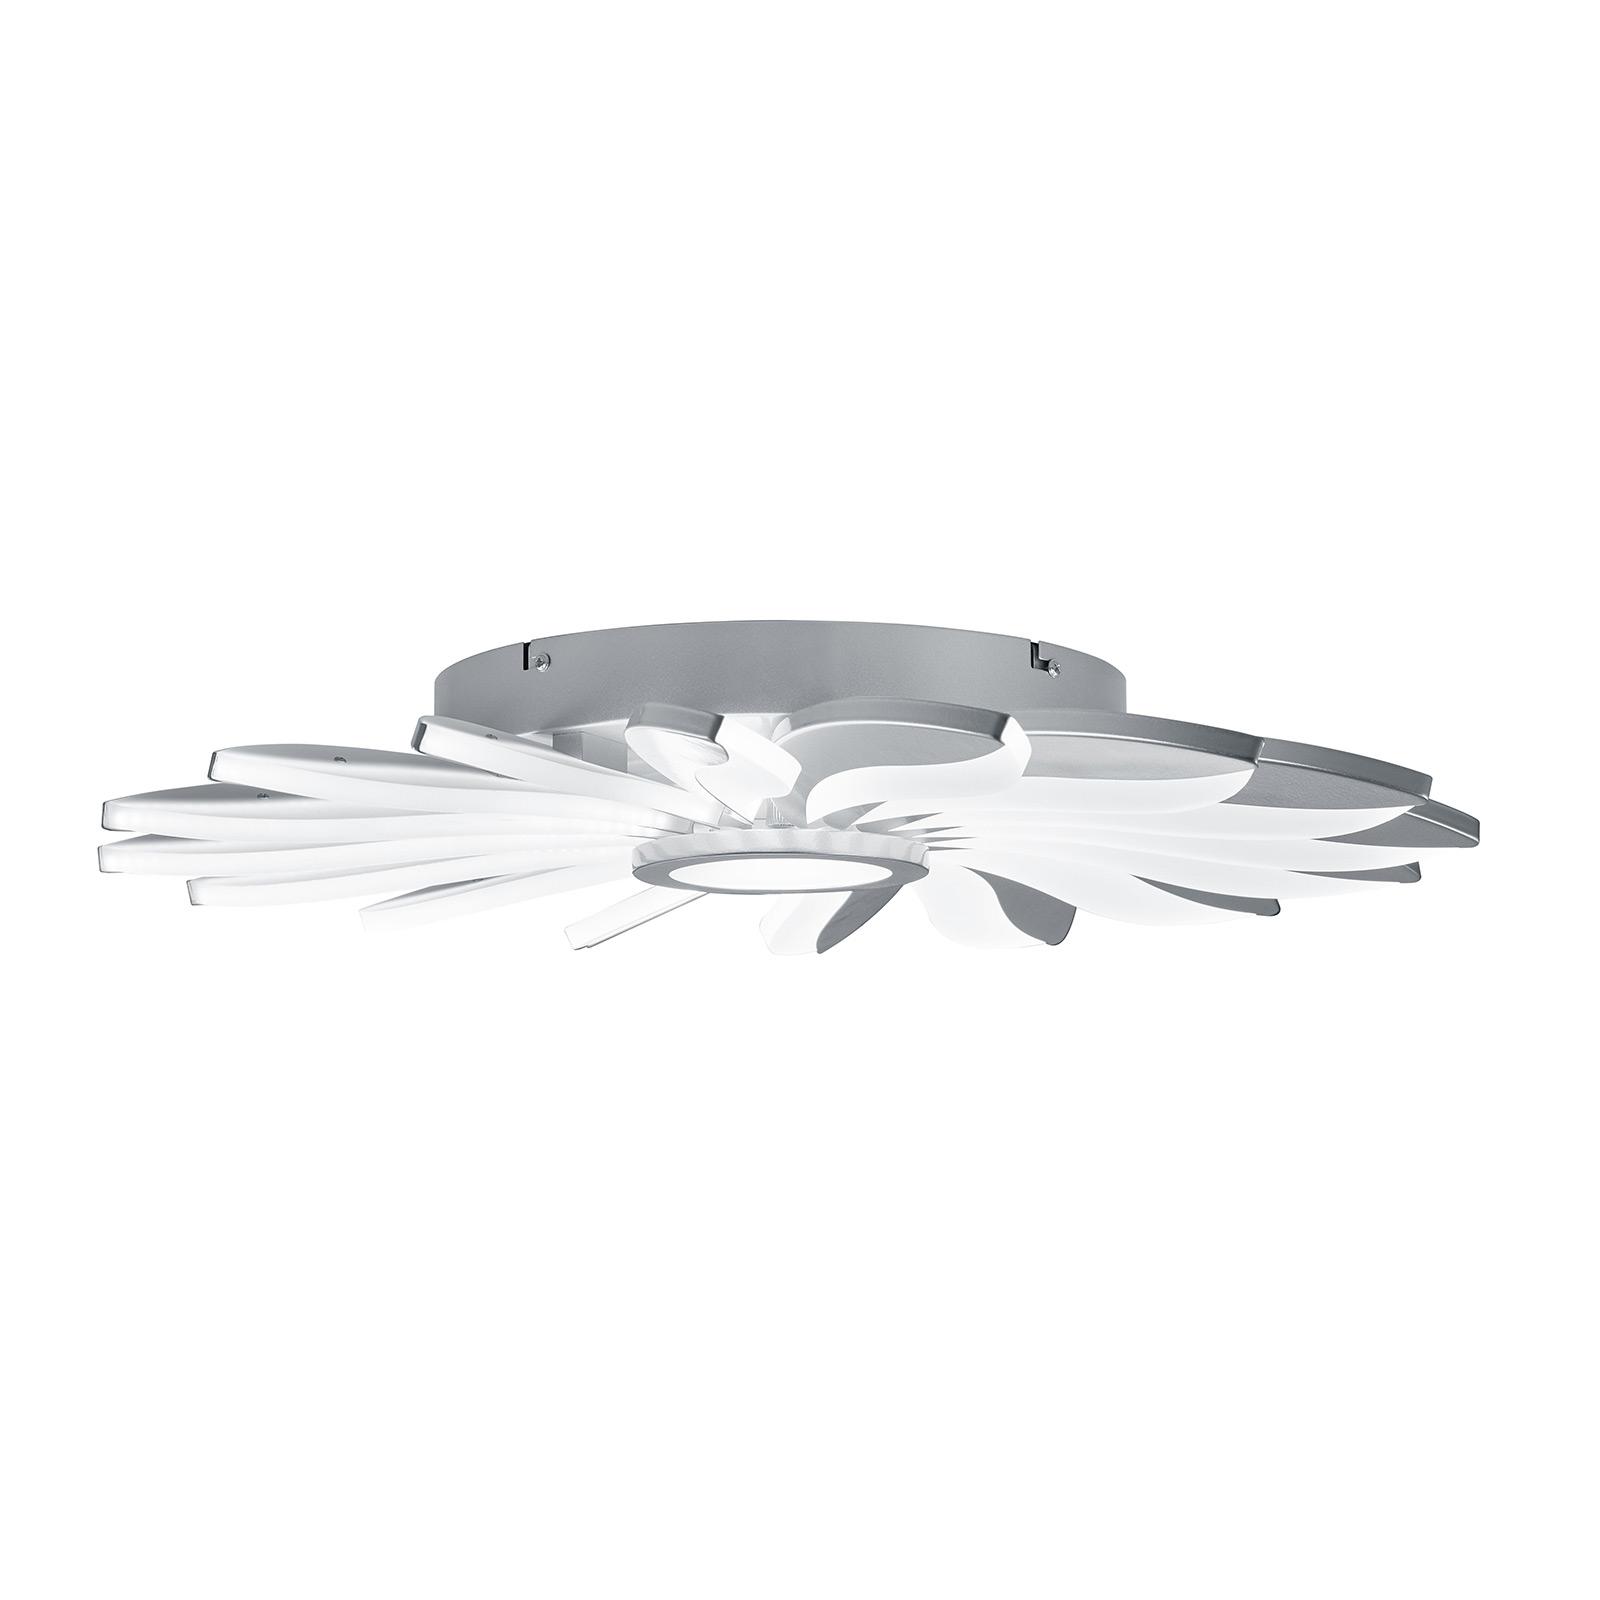 B-Leuchten Sun lampa sufitowa LED